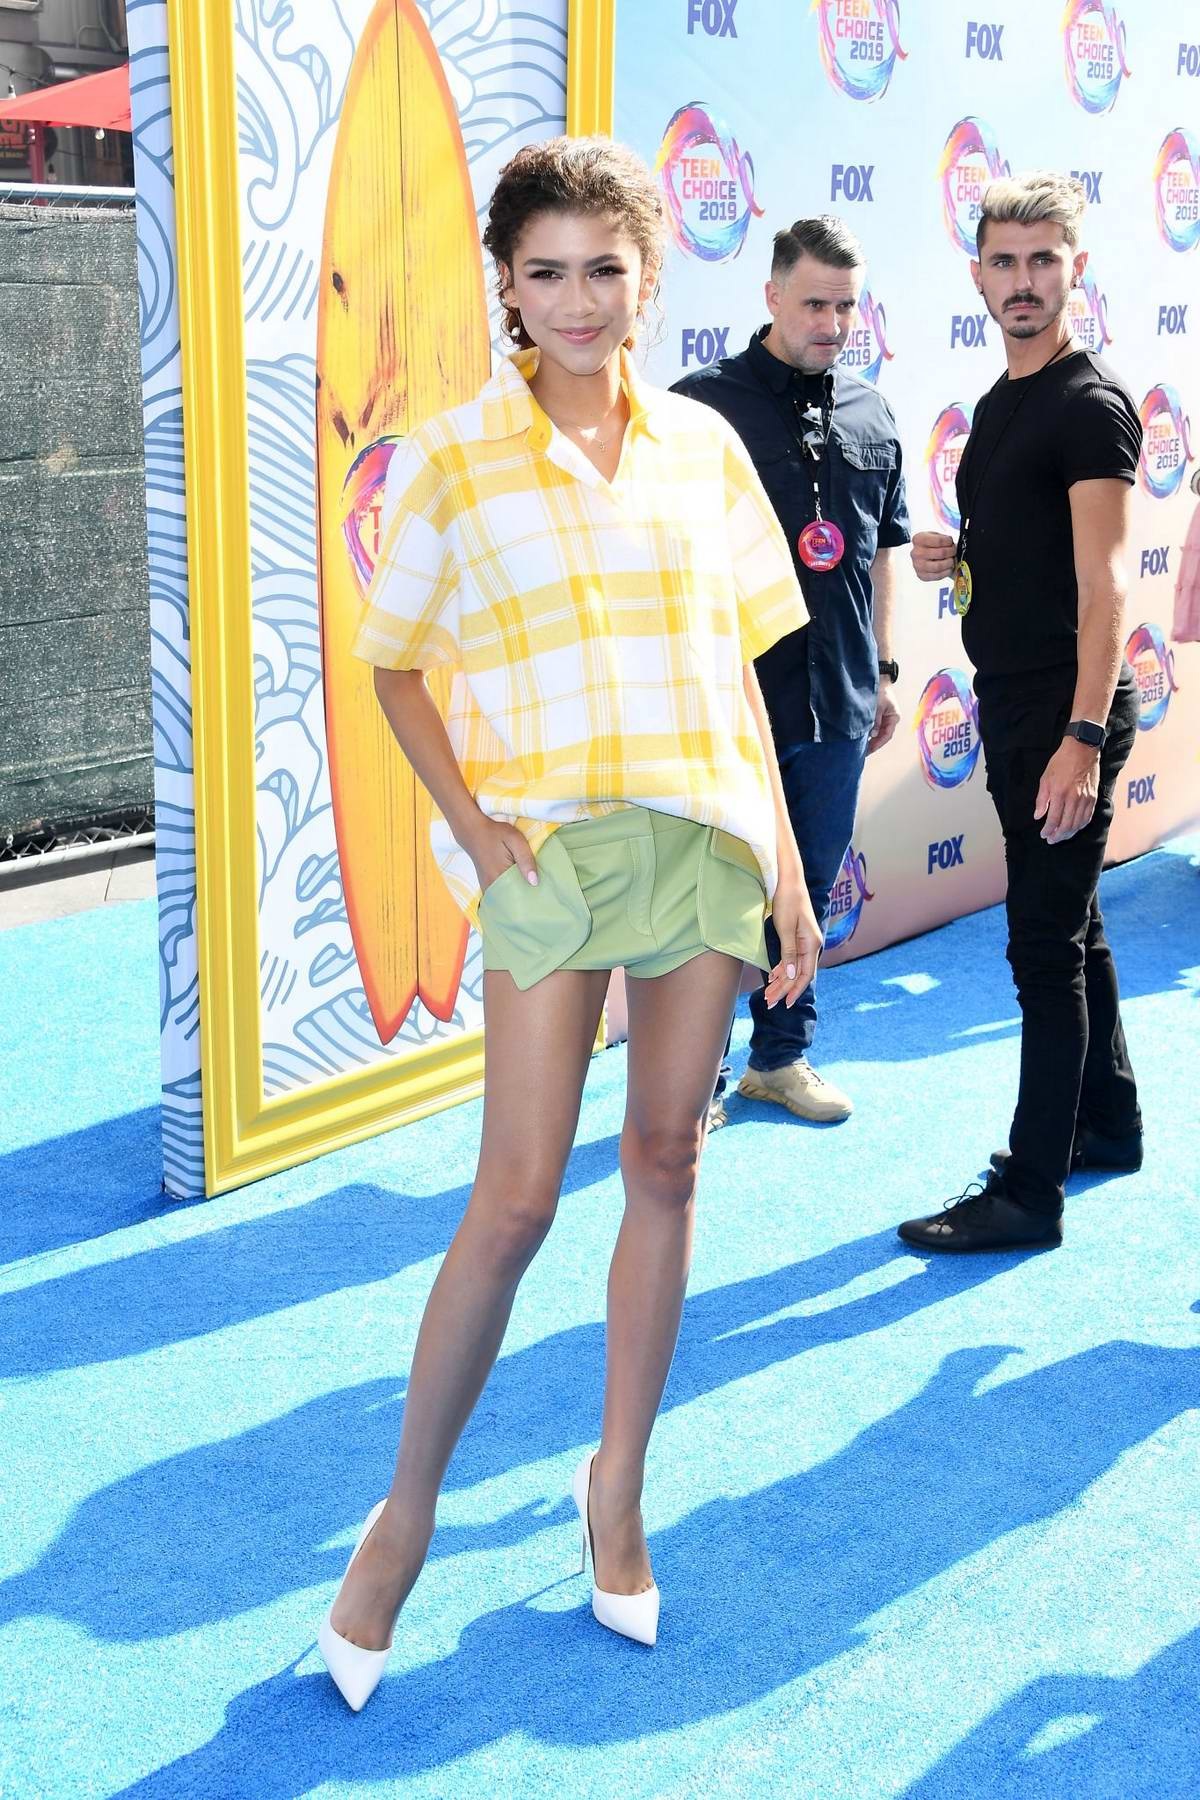 Zendaya Attends The Fox S Teen Choice Awards 2019 In Hermosa Beach California